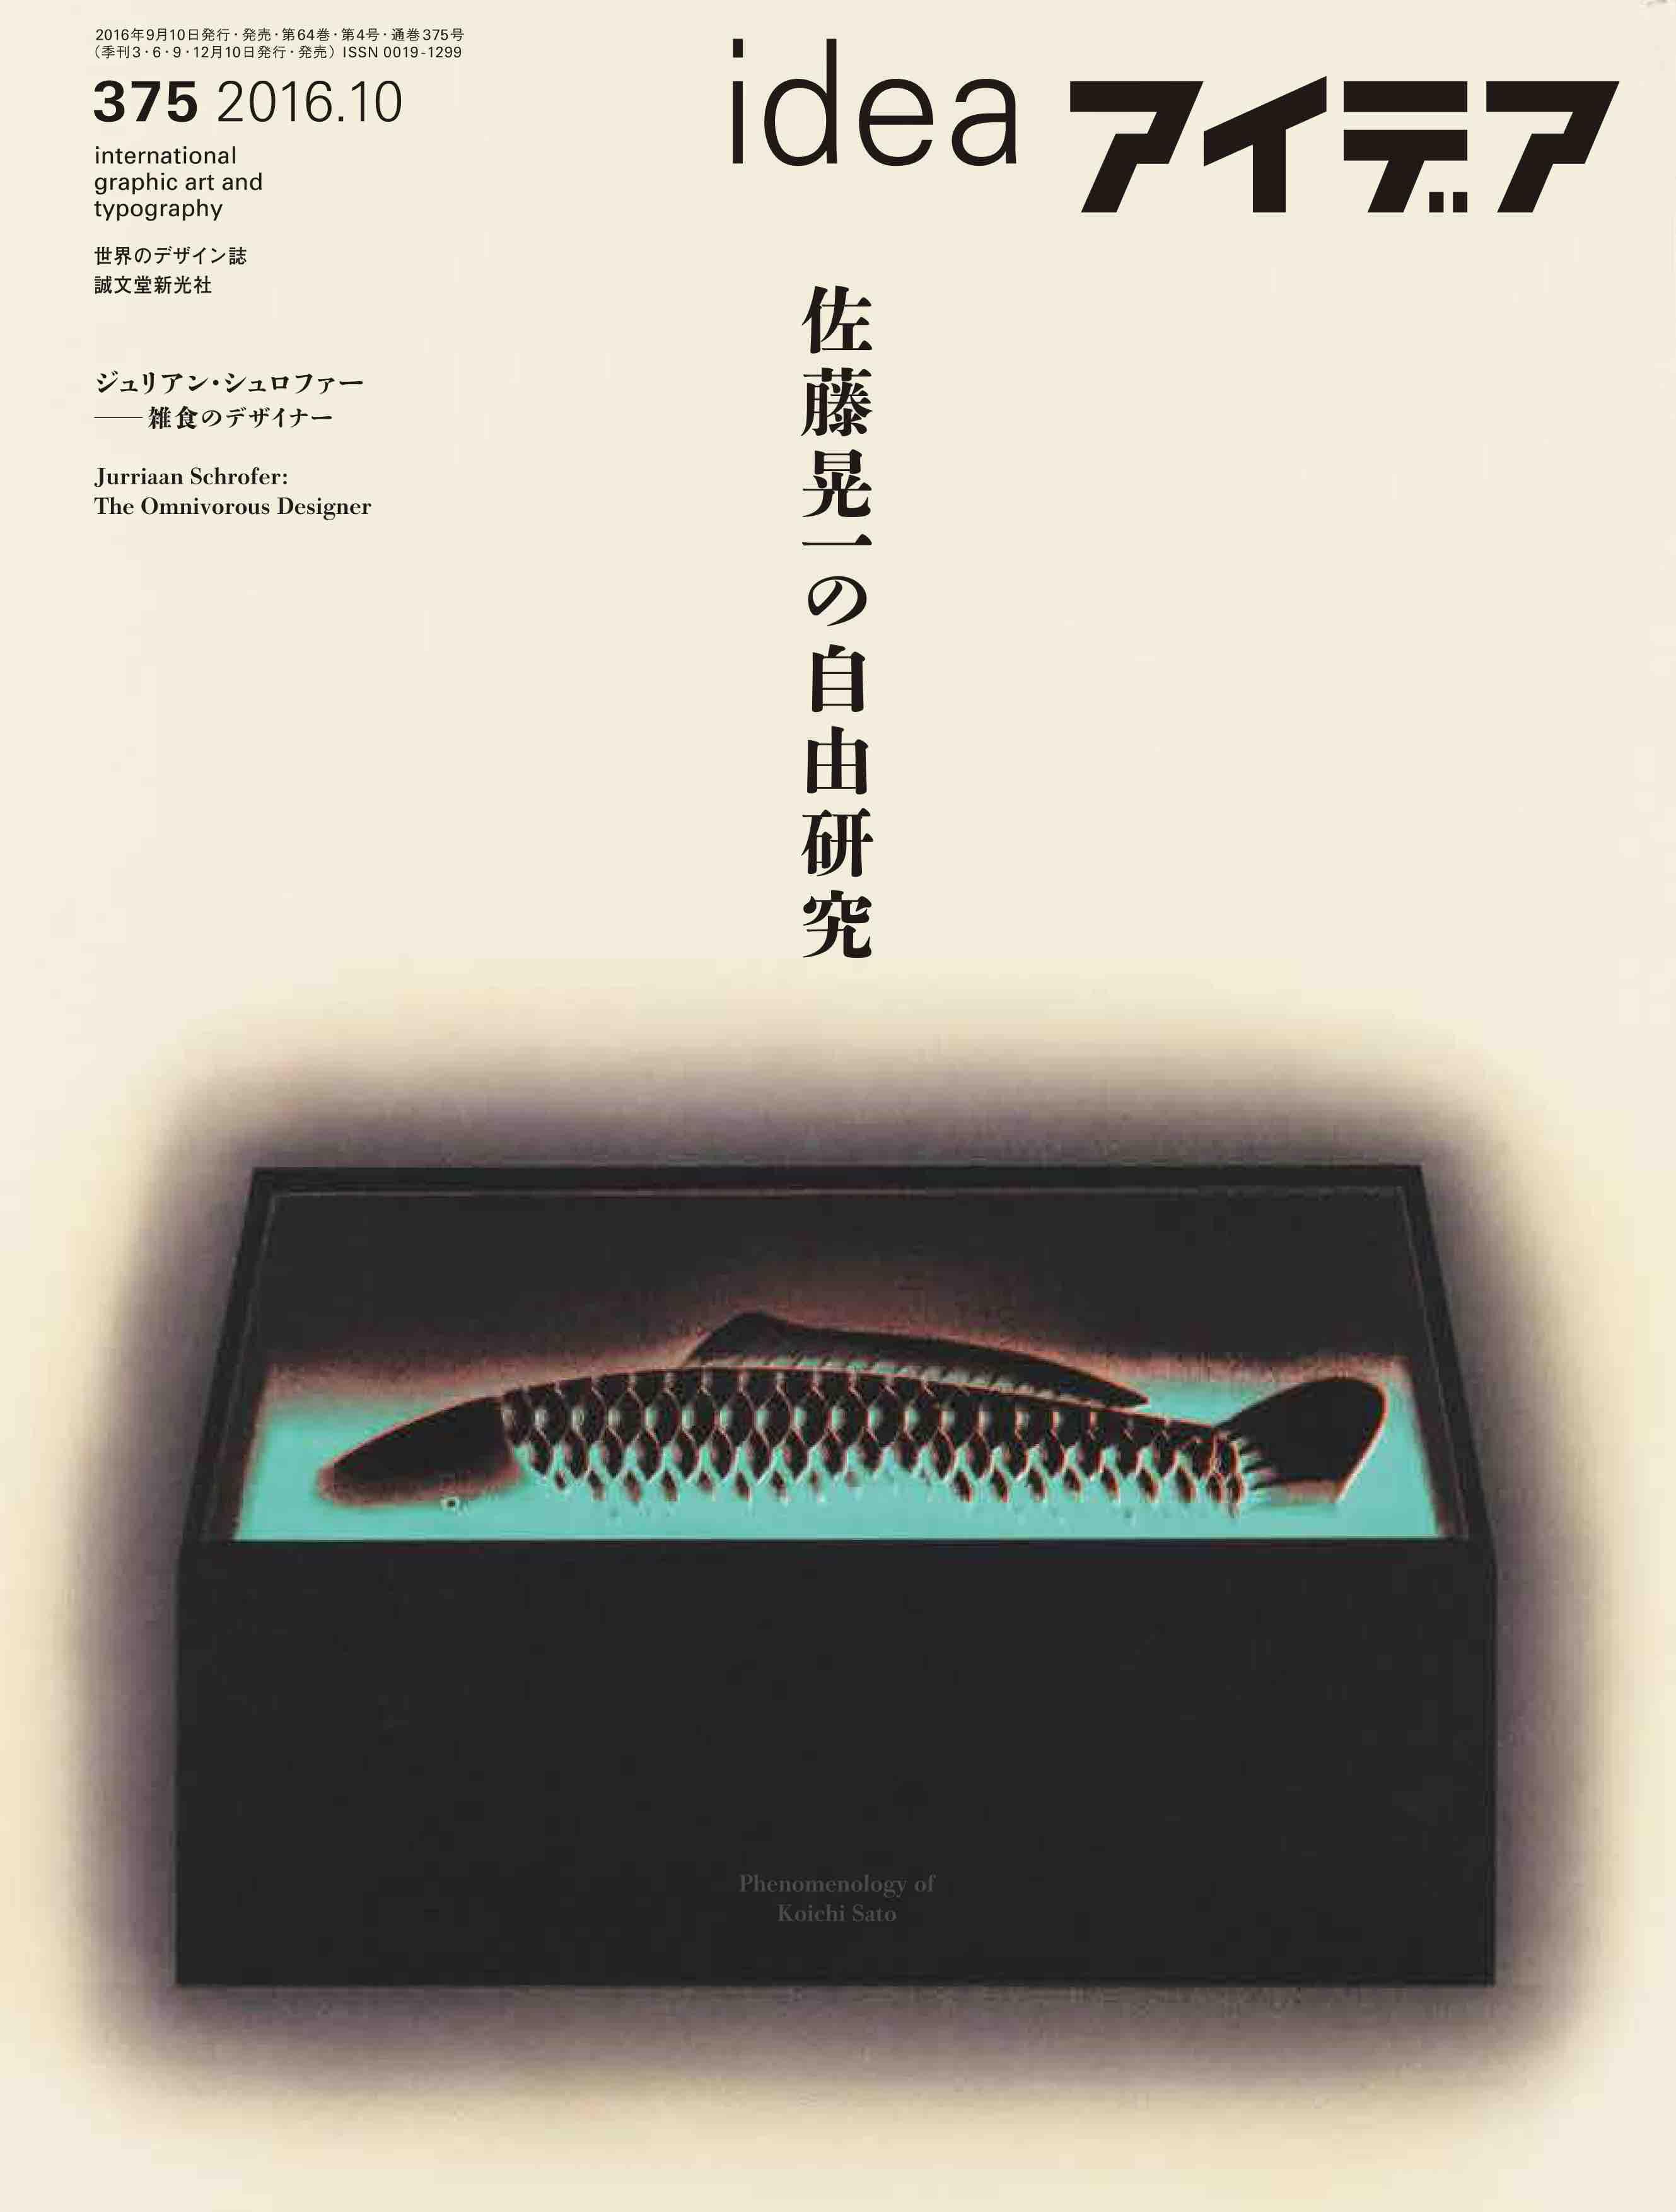 IDEA Magazine | IDEA Magazine - international graphic art